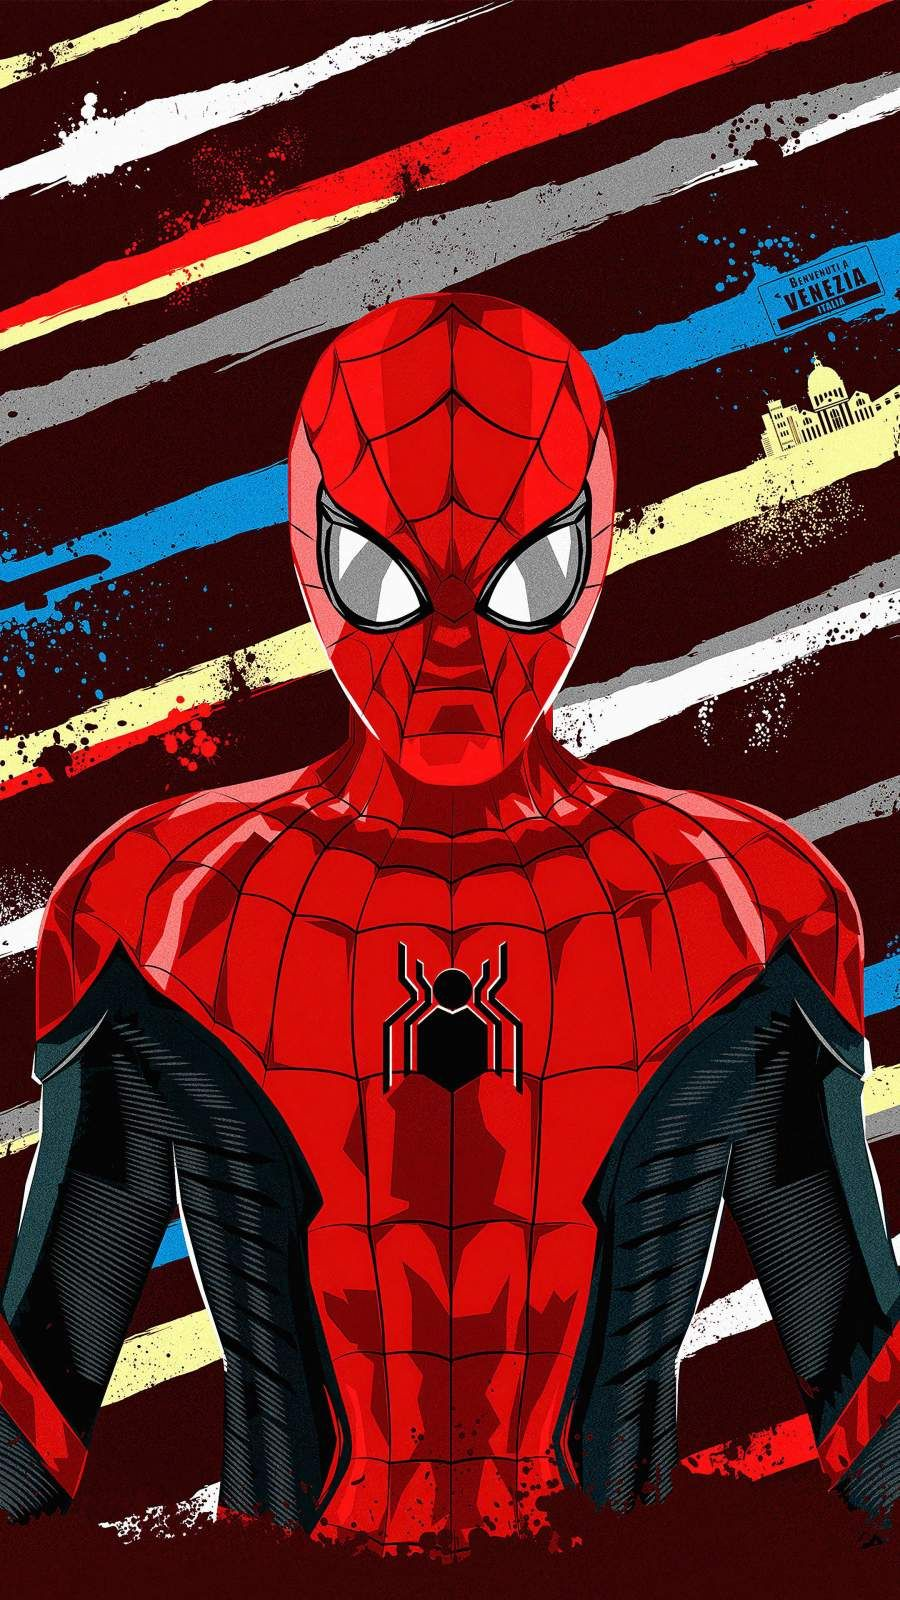 Spiderman Artwork Iphone Wallpaper In 2021 Spiderman Artwork Marvel Spiderman Art Marvel Comics Wallpaper